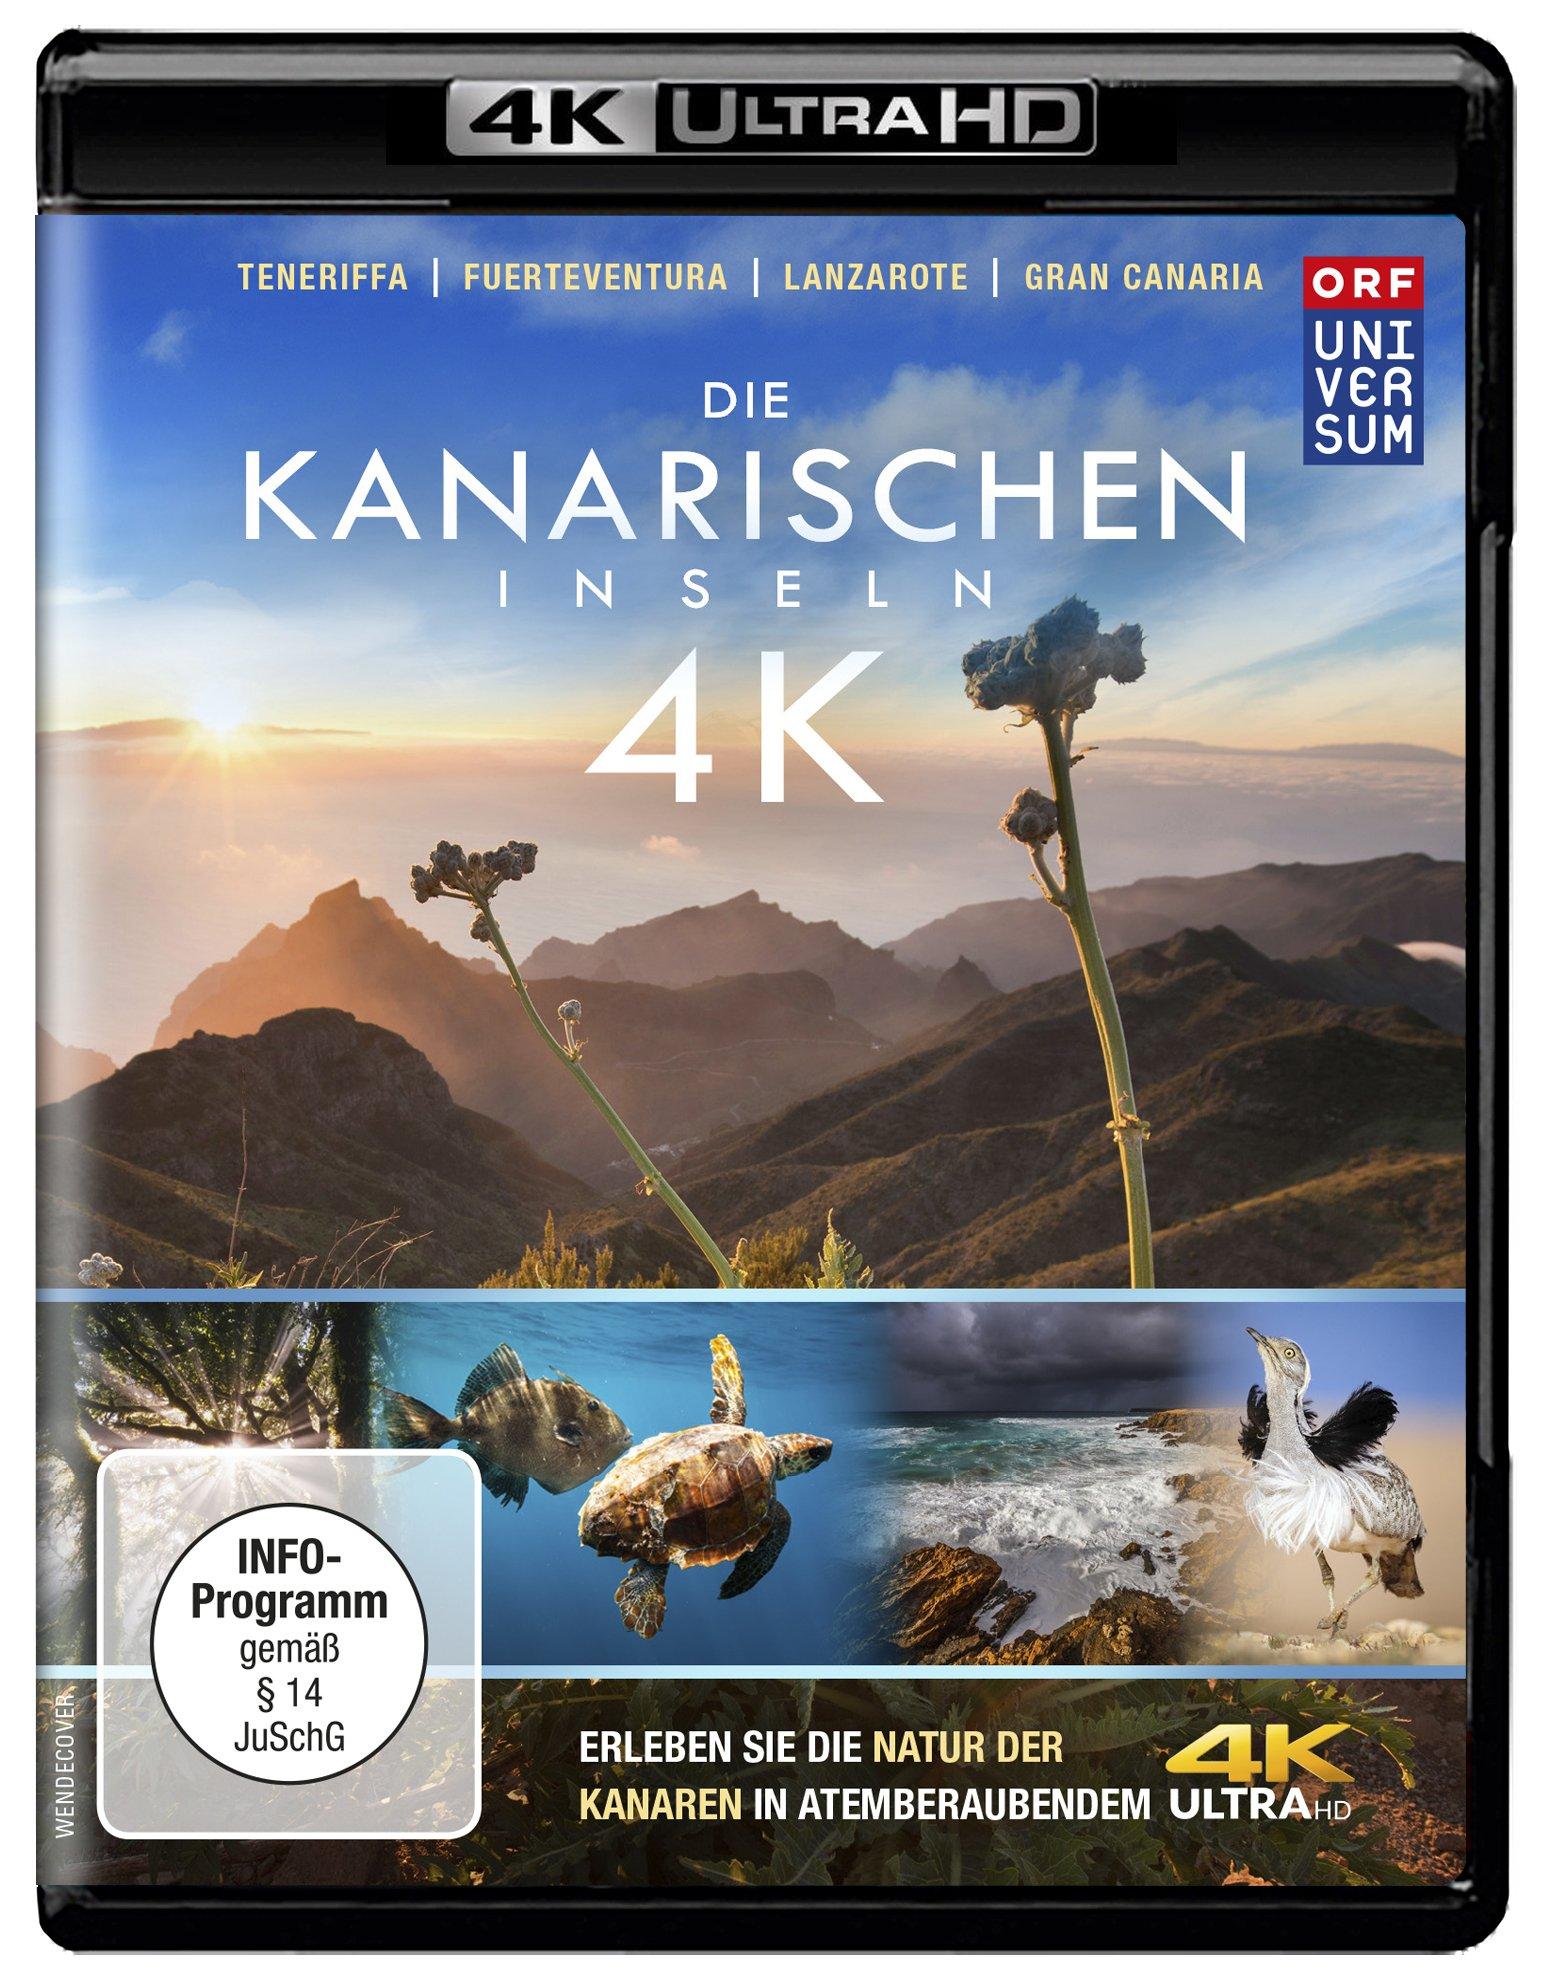 Die Kanarischen Inseln (4K Ultra HD) Teneriffa l Gran Canaria l Lanzarote l Fuerteventura l La Gomer